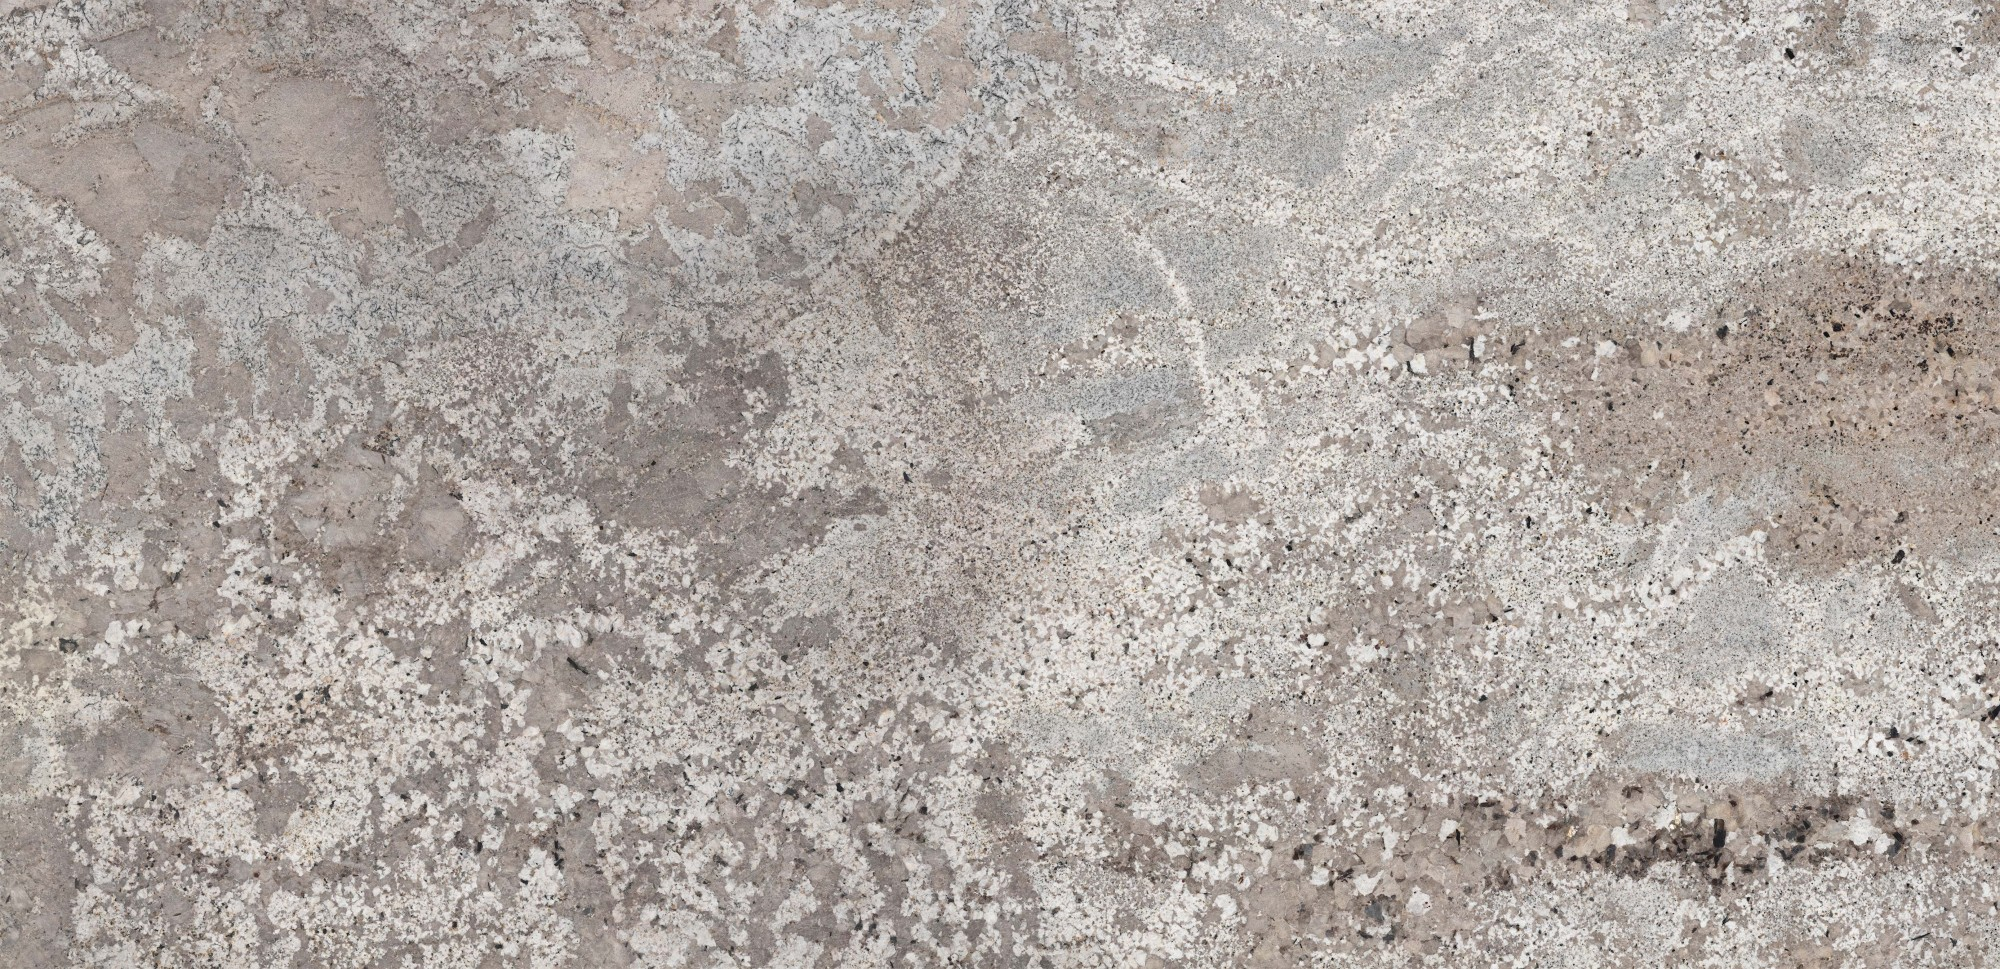 granit sensa bianco antico sur le bassin d'arcachon